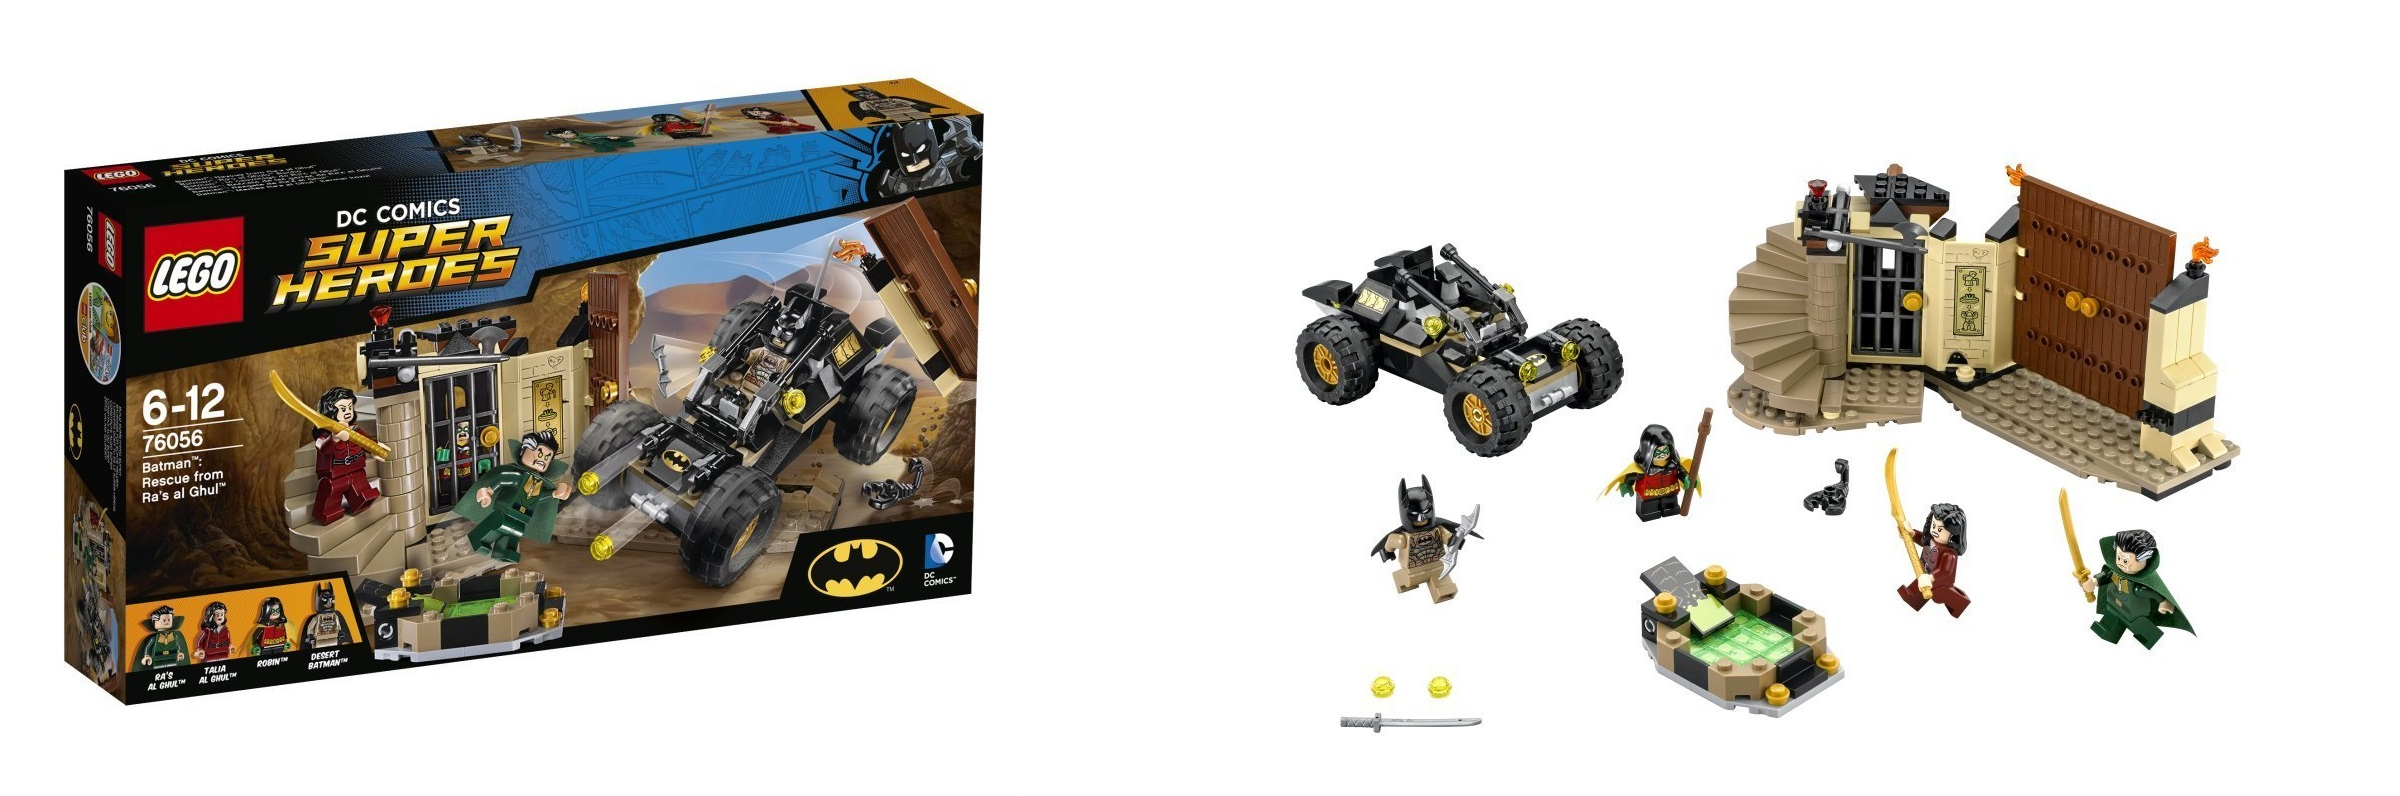 LEGO 76065 Batm...